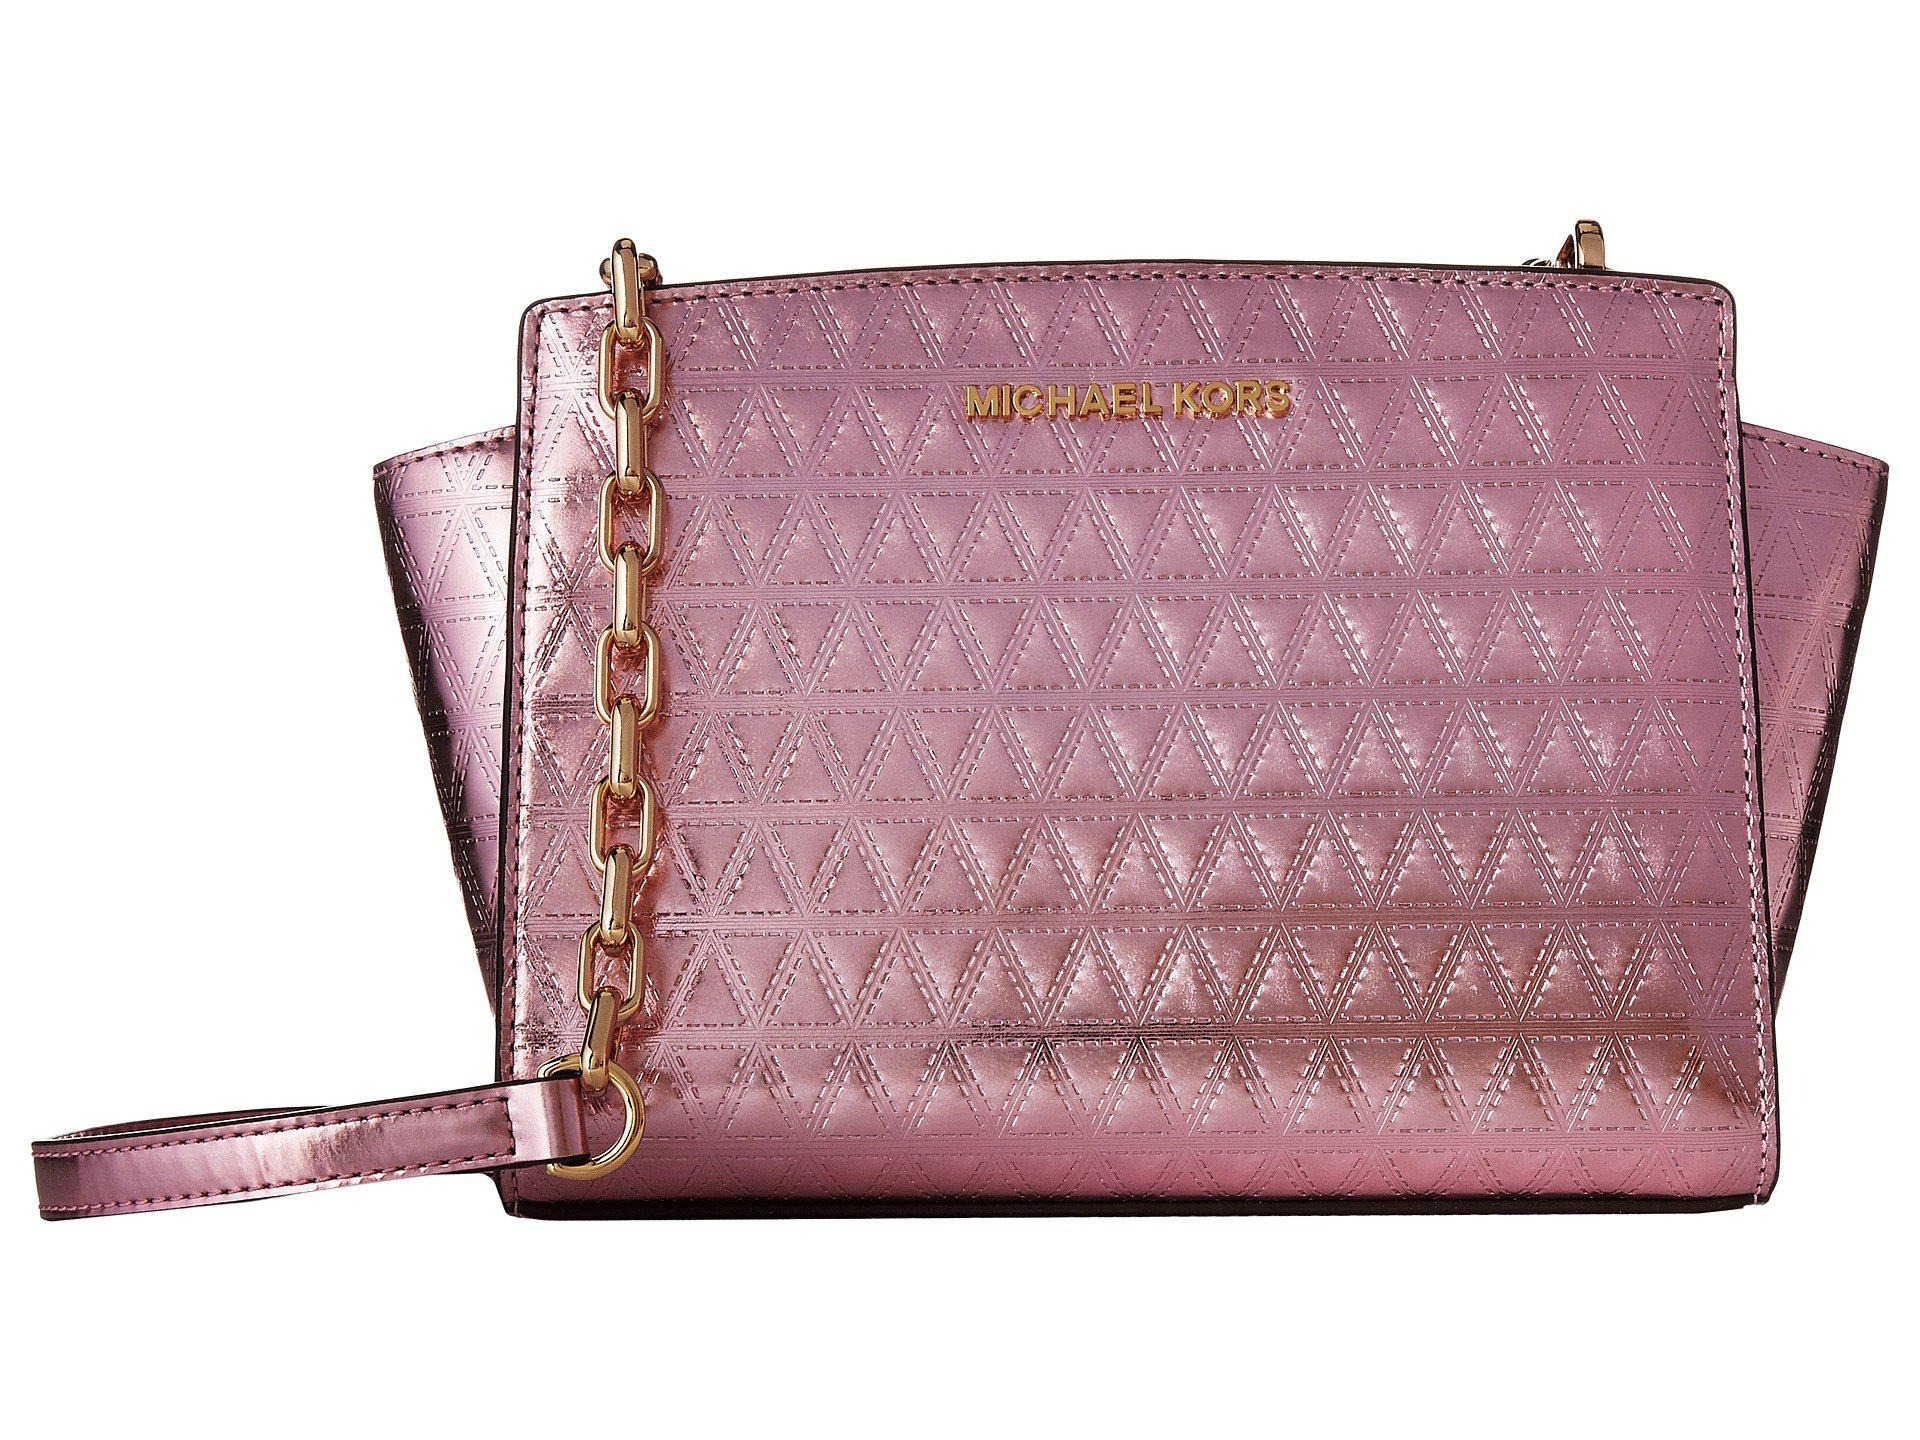 ... bag saffiano leather 0fe94 a8bd5  australia lyst michael michael kors  selma medium messenger in pink e3495 783db 5805734bcdc18